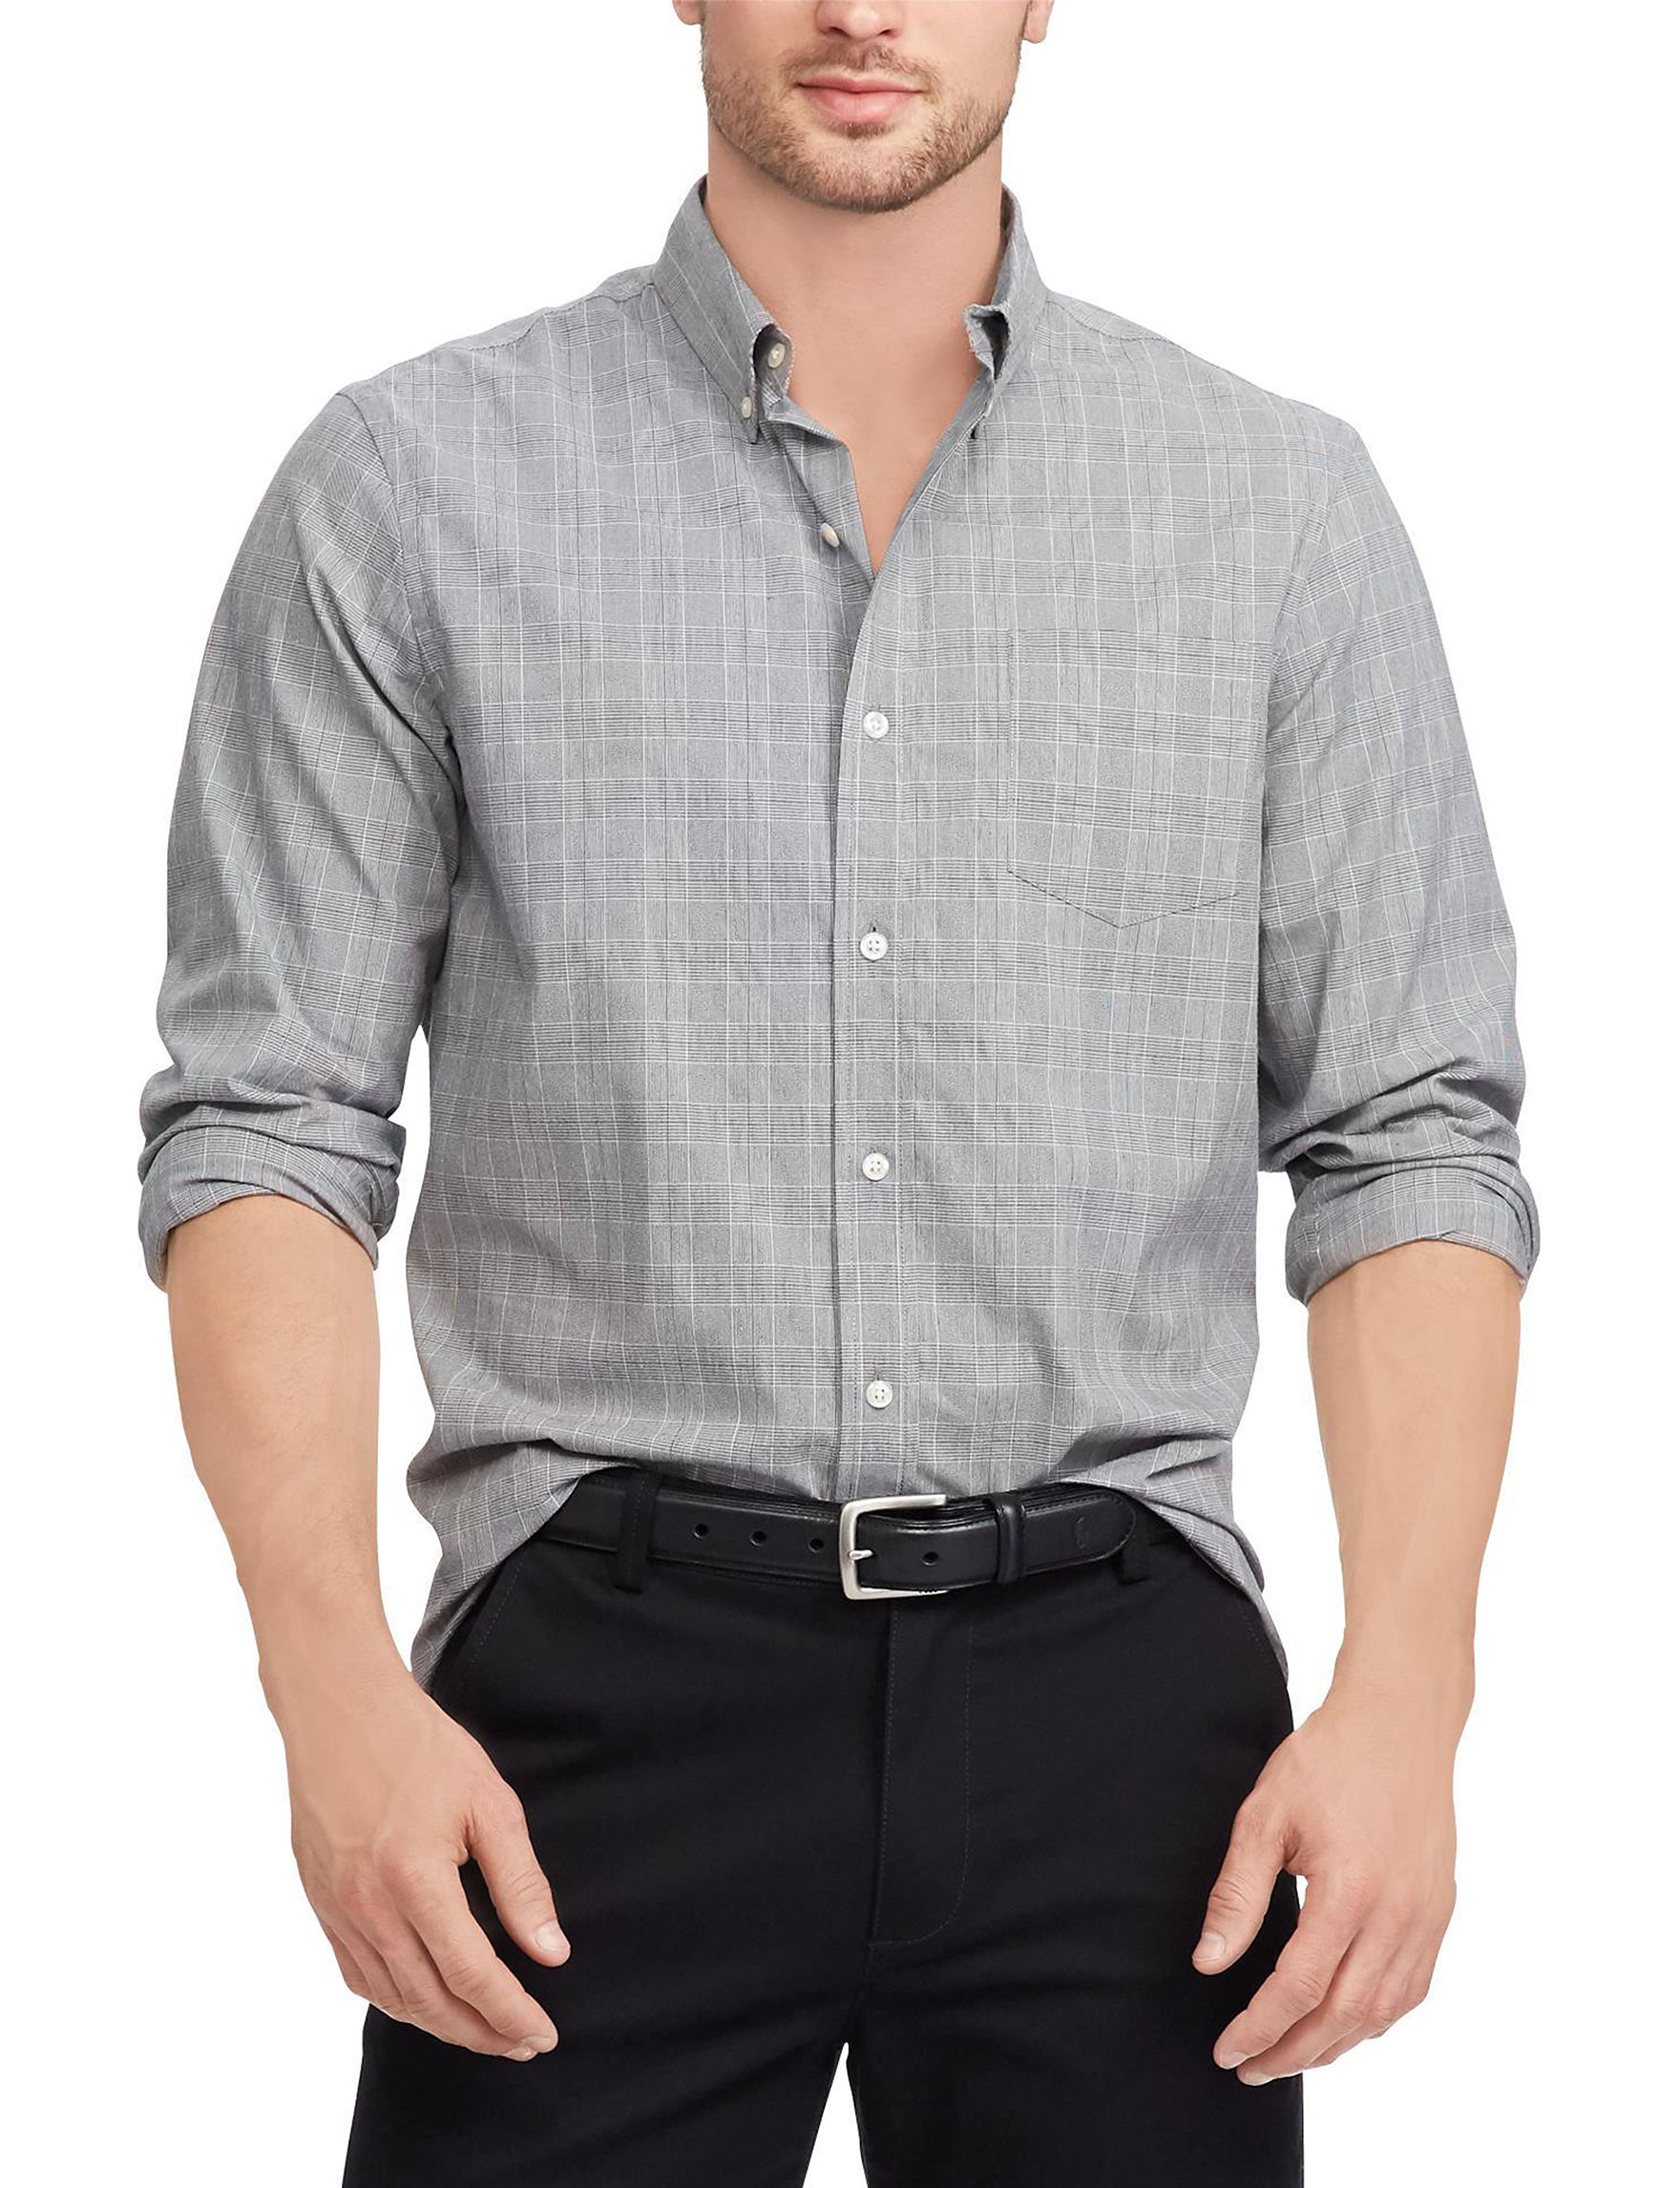 Chaps Grey Casual Button Down Shirts